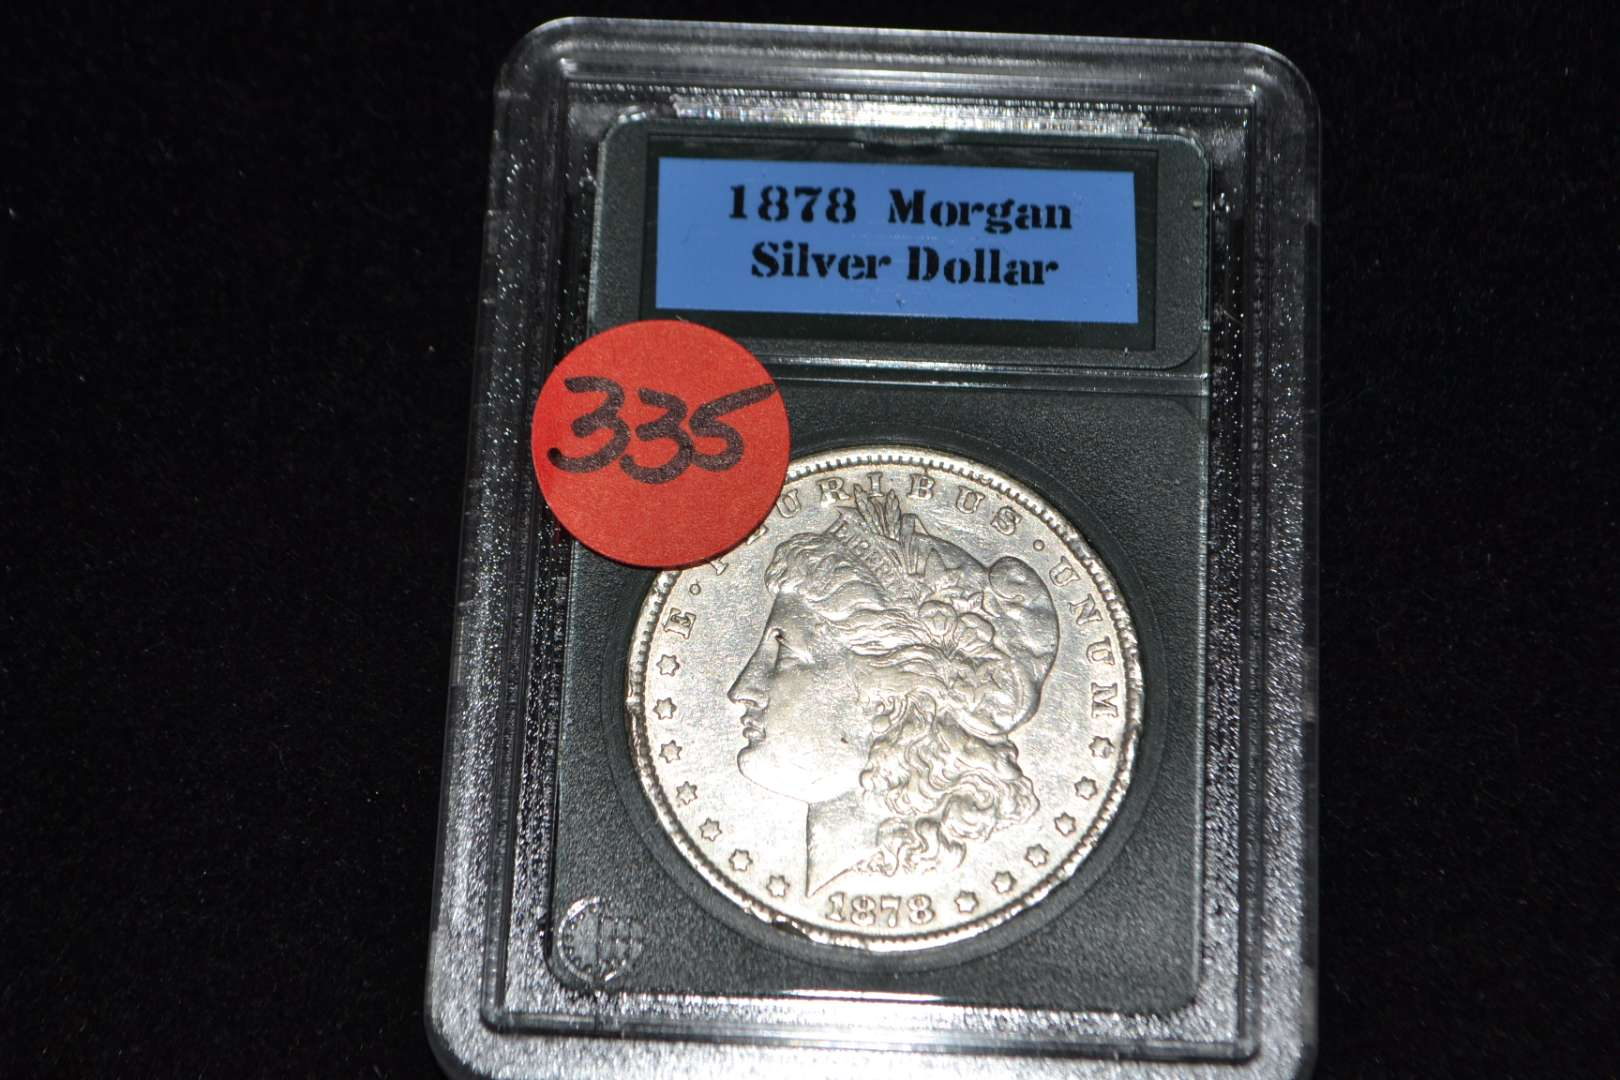 Lot # 335 1878 MORGAN SILVER DOLLAR W/7 TAIL FEATHERS